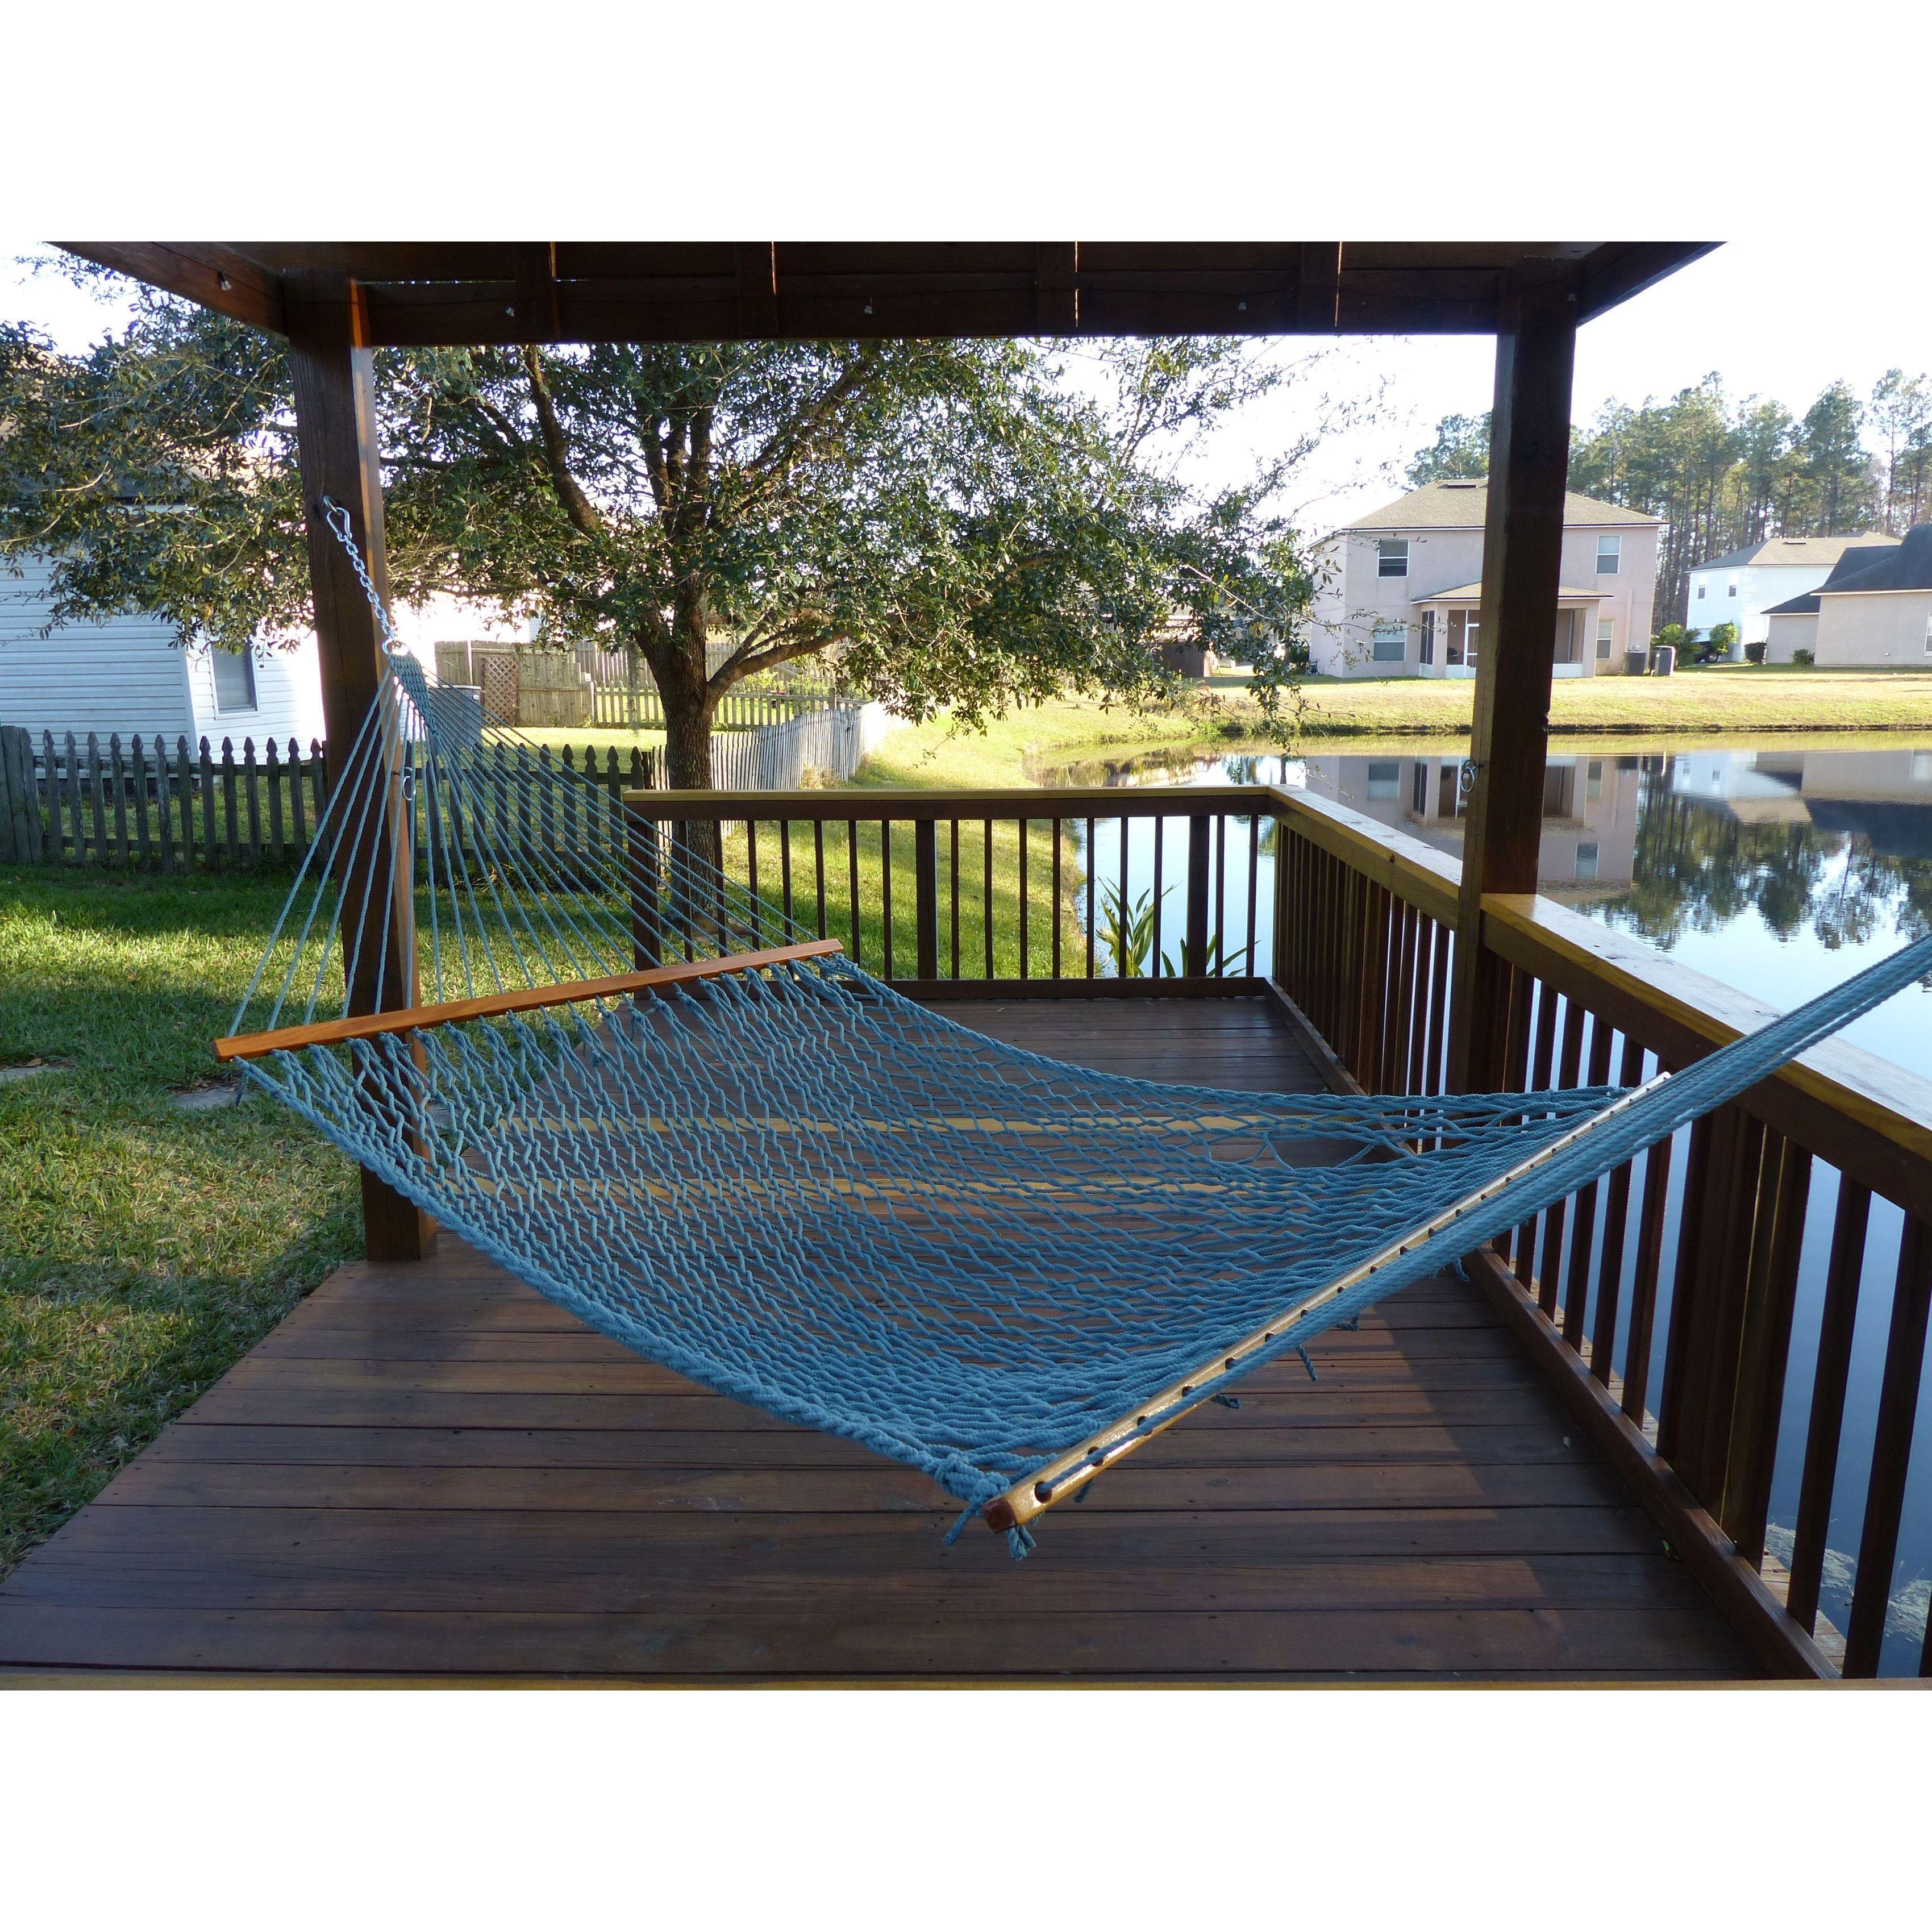 Castaway spruce polyester rope hammock blue acrylic wssp